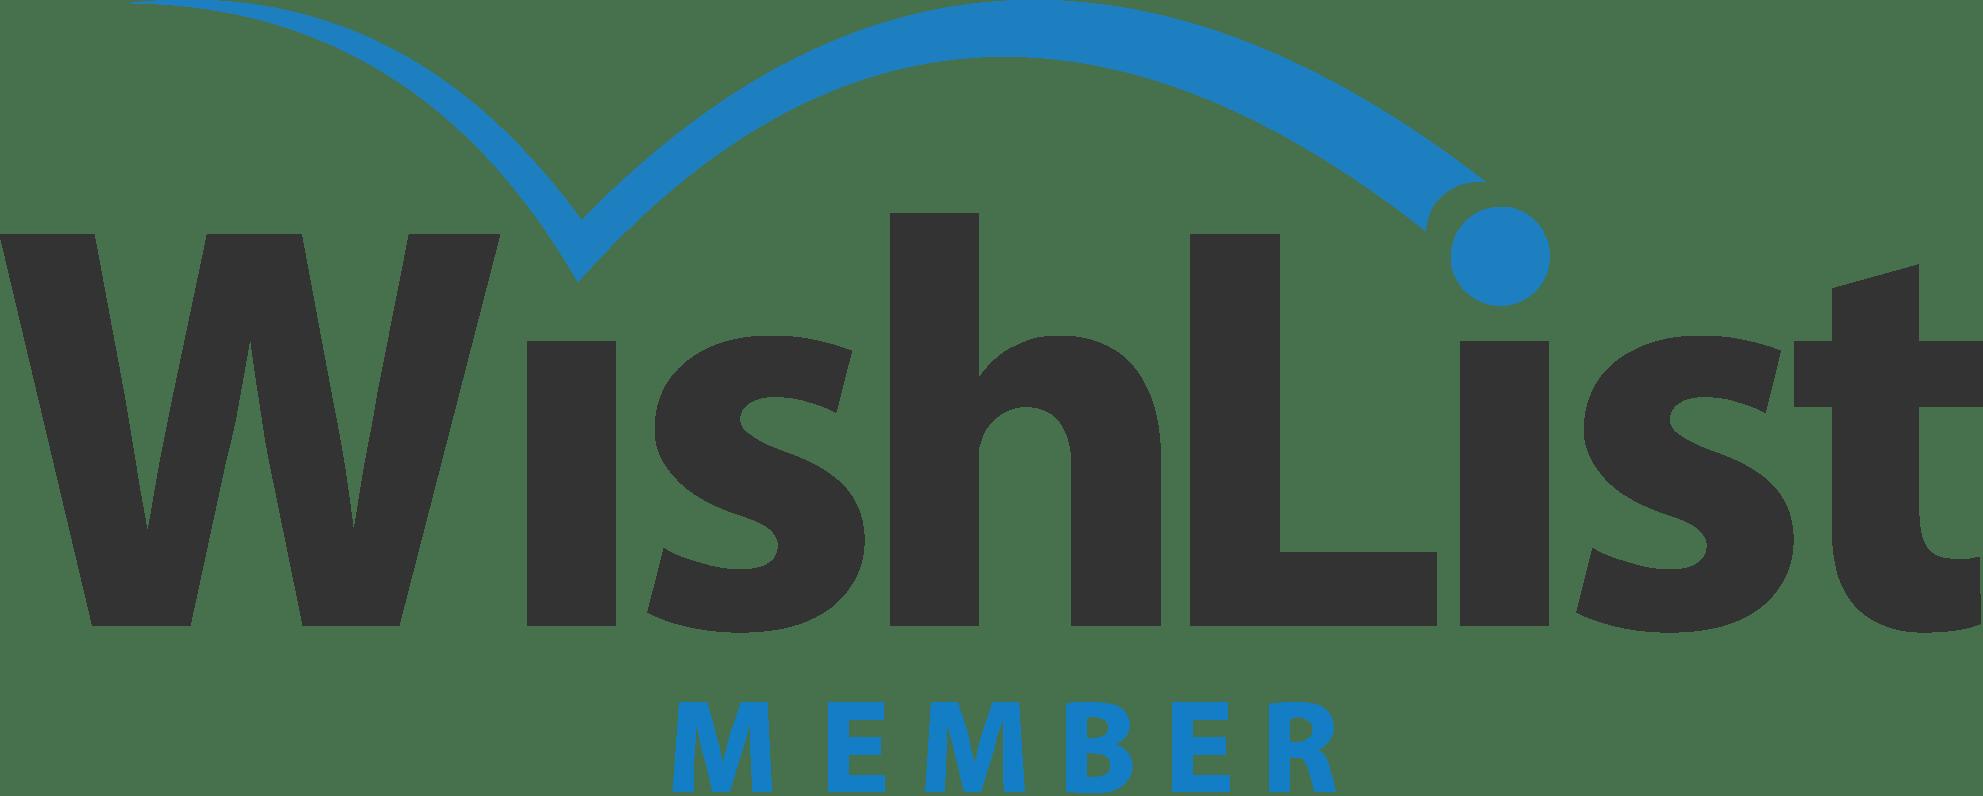 871f6dee45a23 WishList Member - Membership Software - WordPress Membership Plugin -  Membership Sites